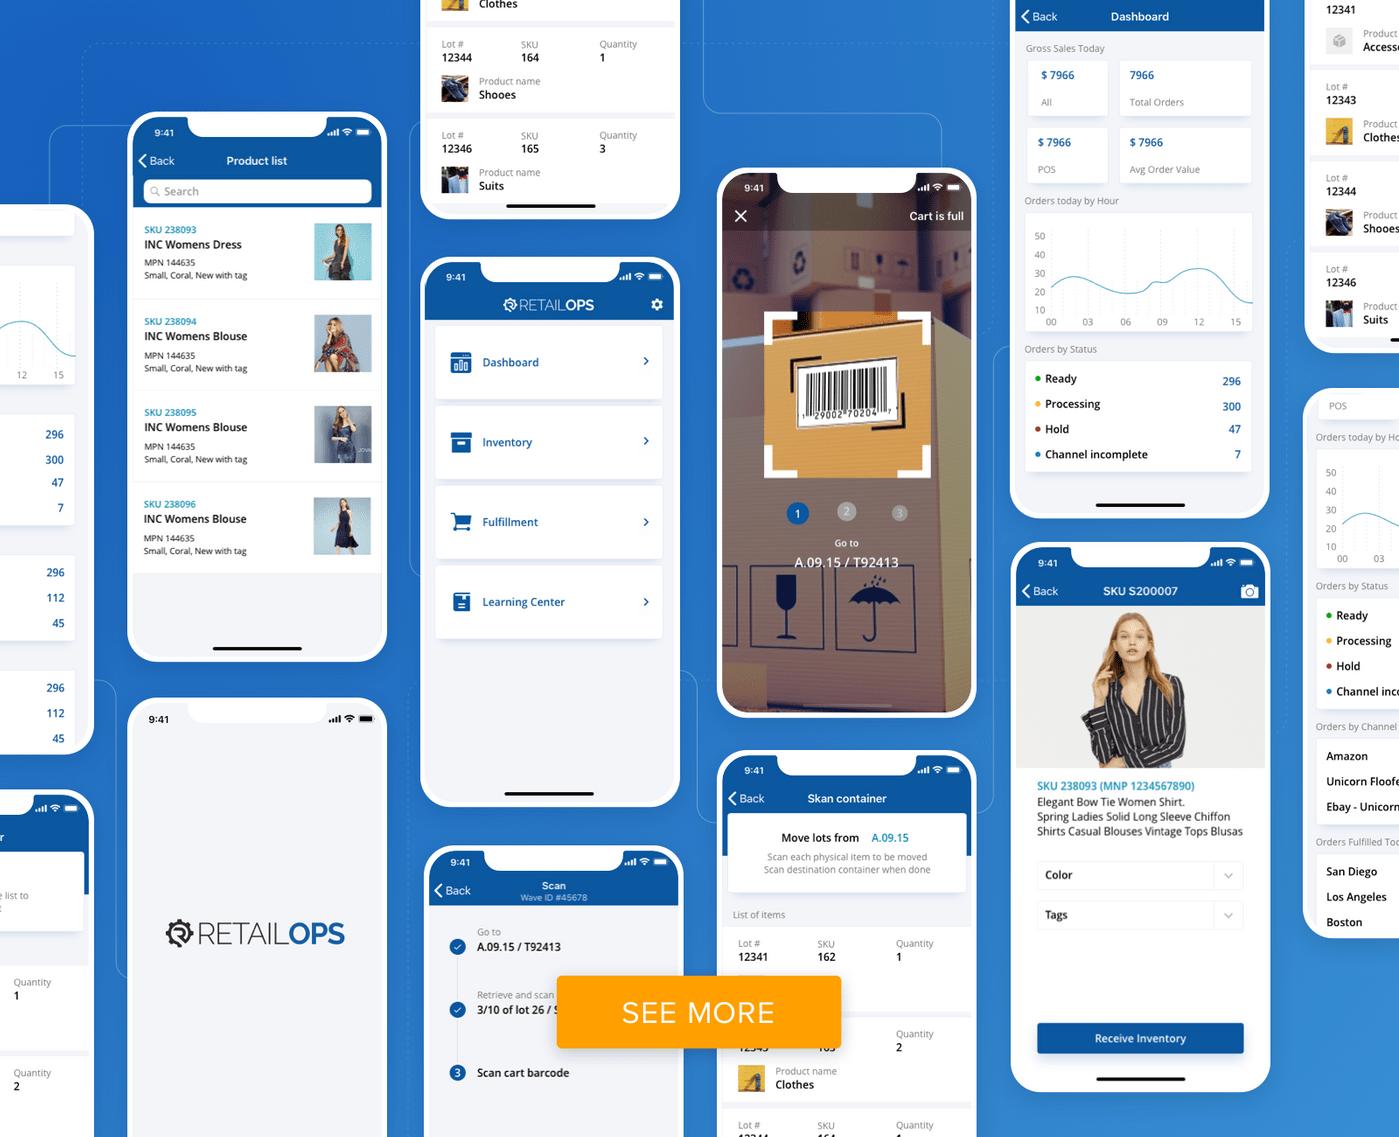 RetailOps design by Cleveroad